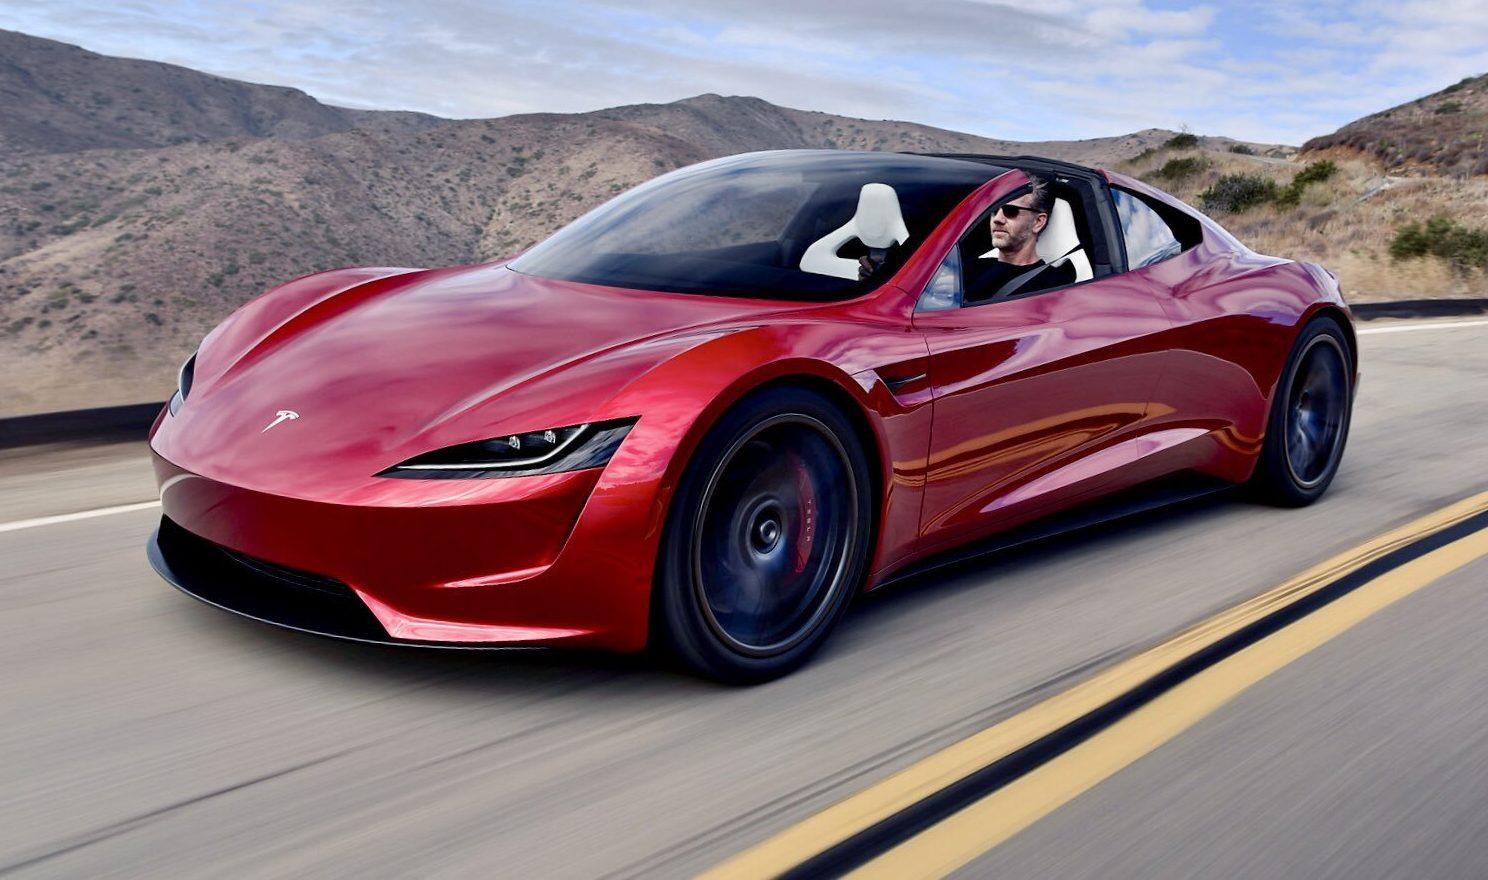 tesla s next gen roadster is ushering in the automotive industry s